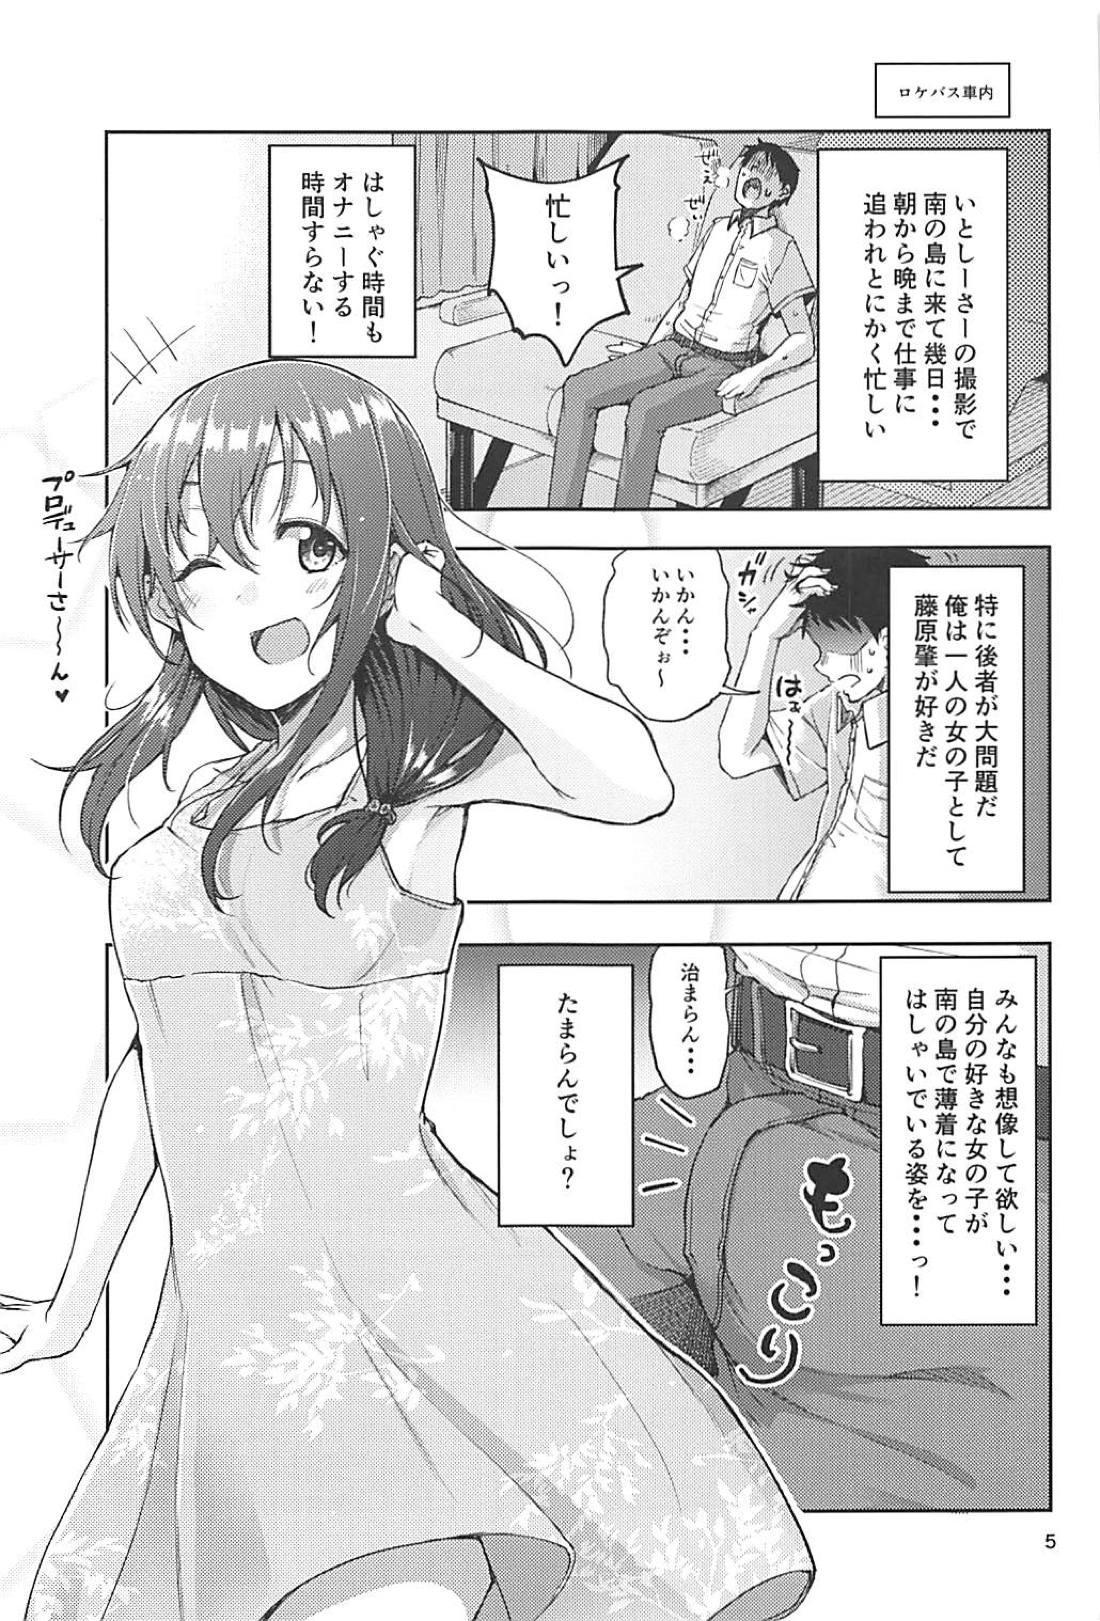 Hajime-chan to Itoshiisaa 2